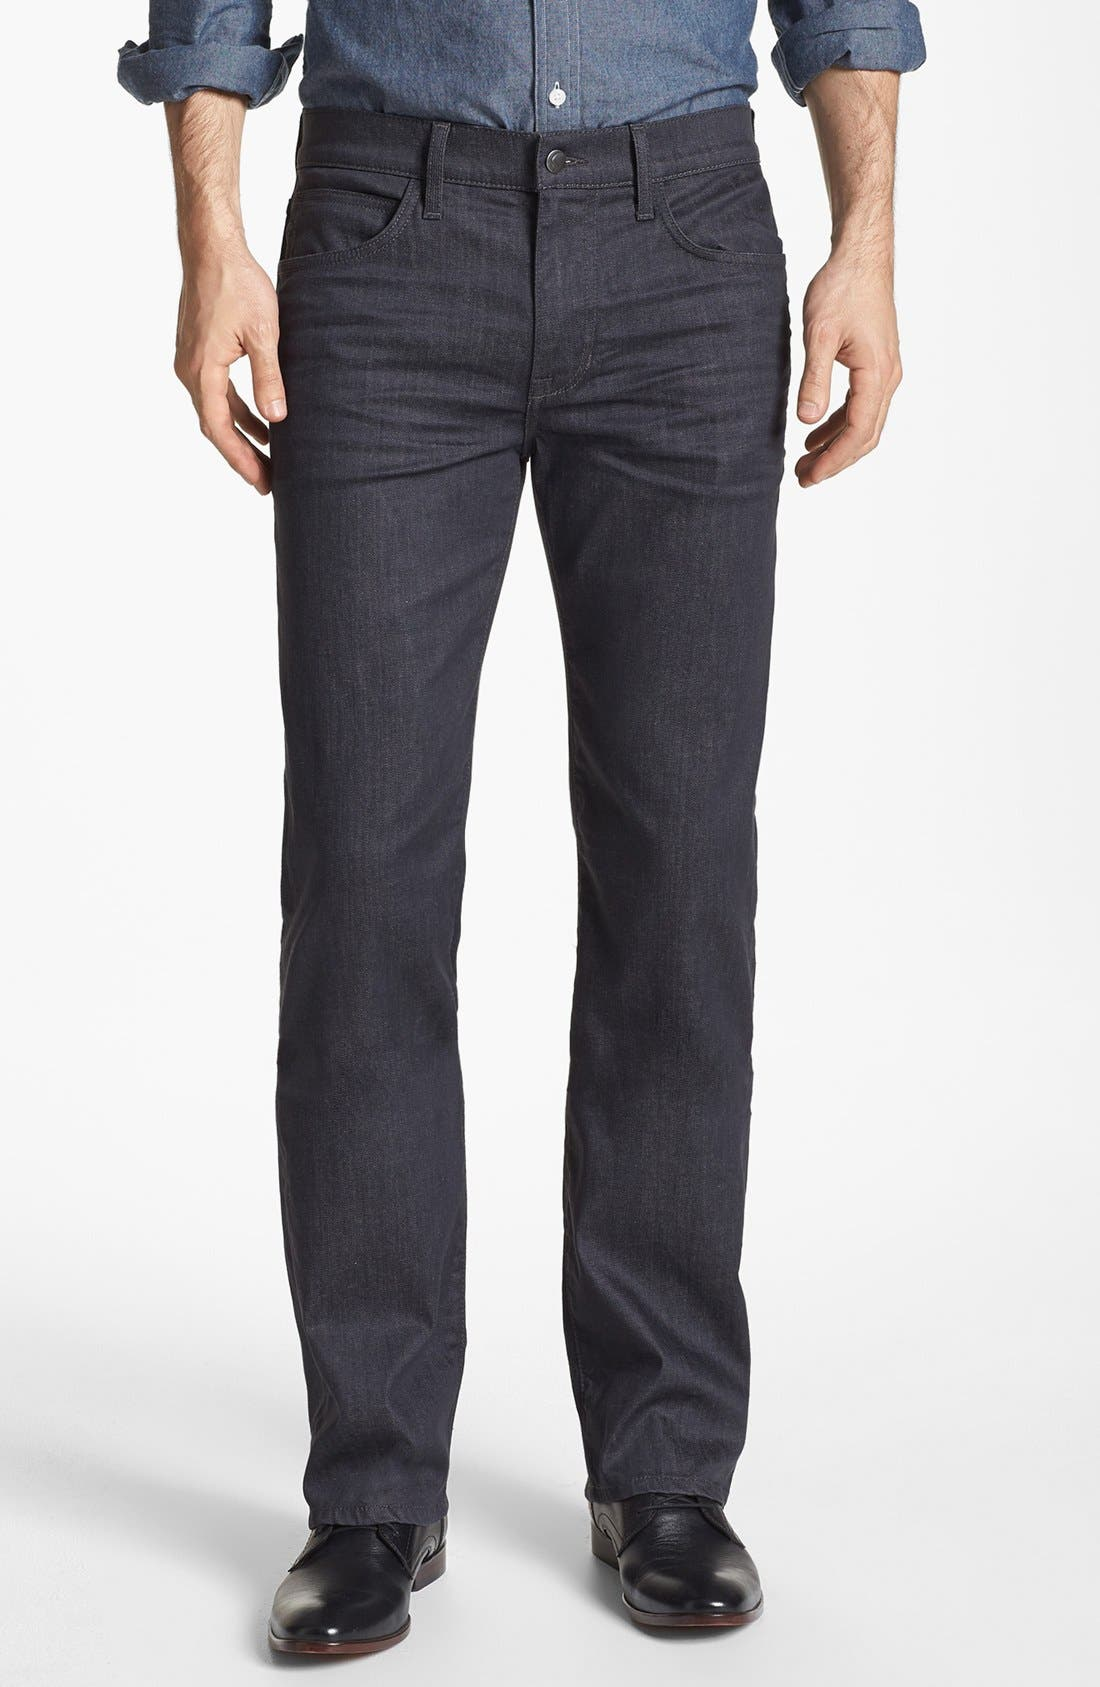 Alternate Image 1 Selected - Joe's 'Classic' Straight Leg Jeans (Jeremy)